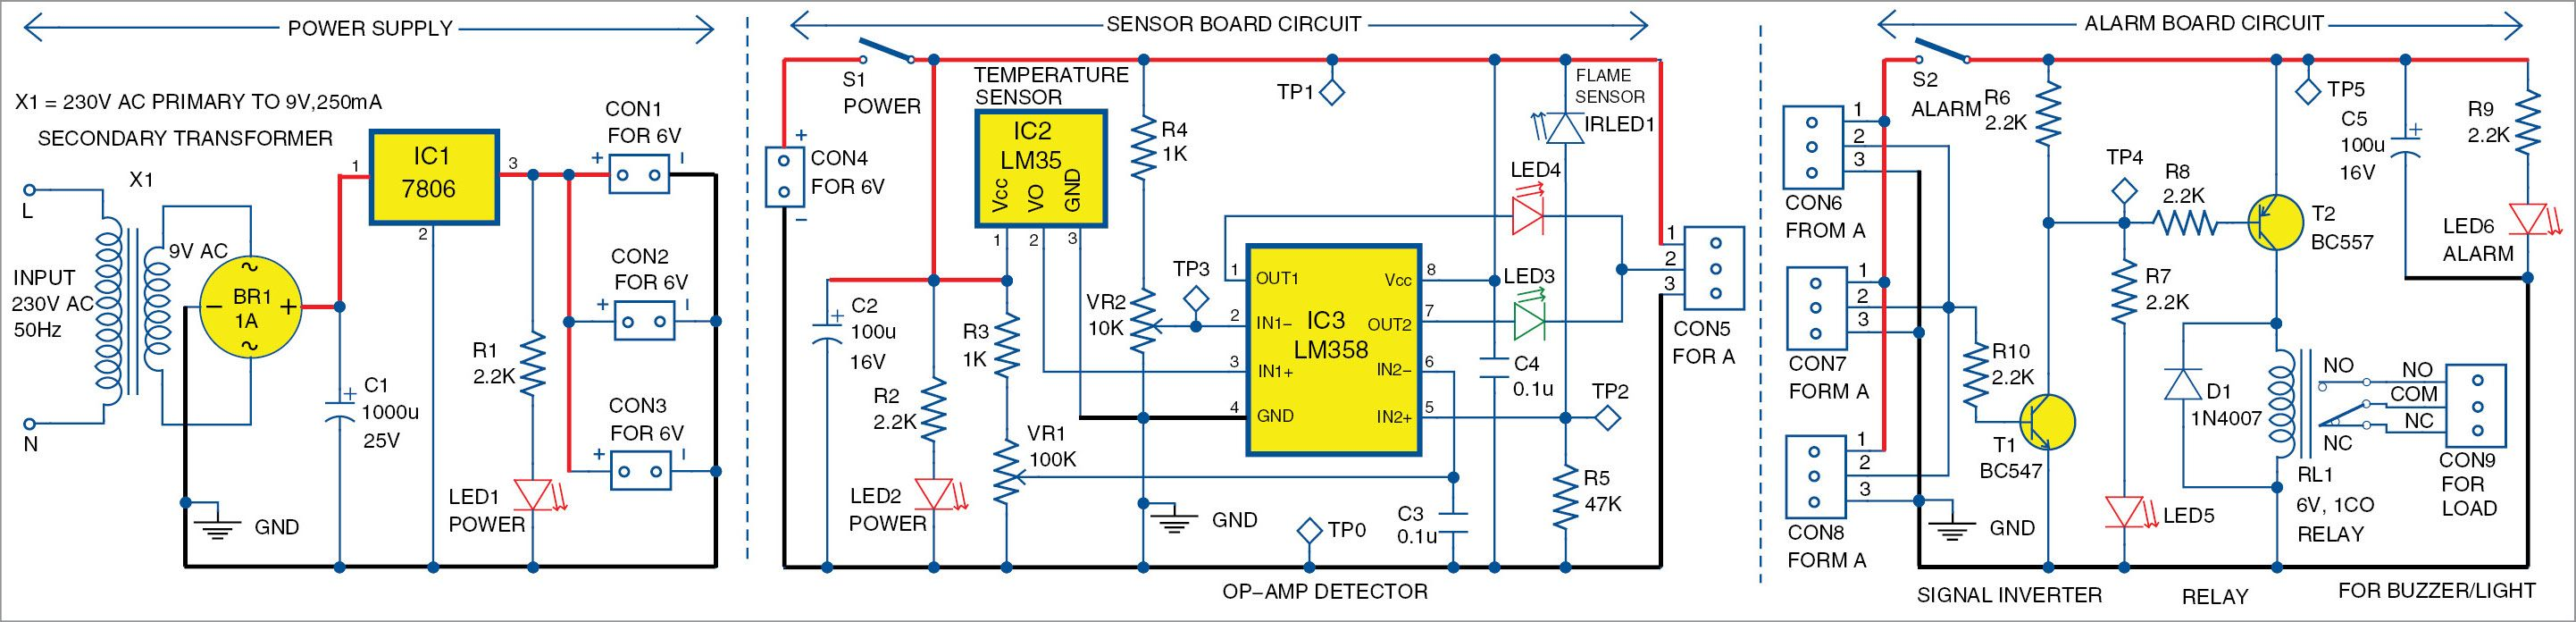 medium resolution of simple multi sensor fire alarm